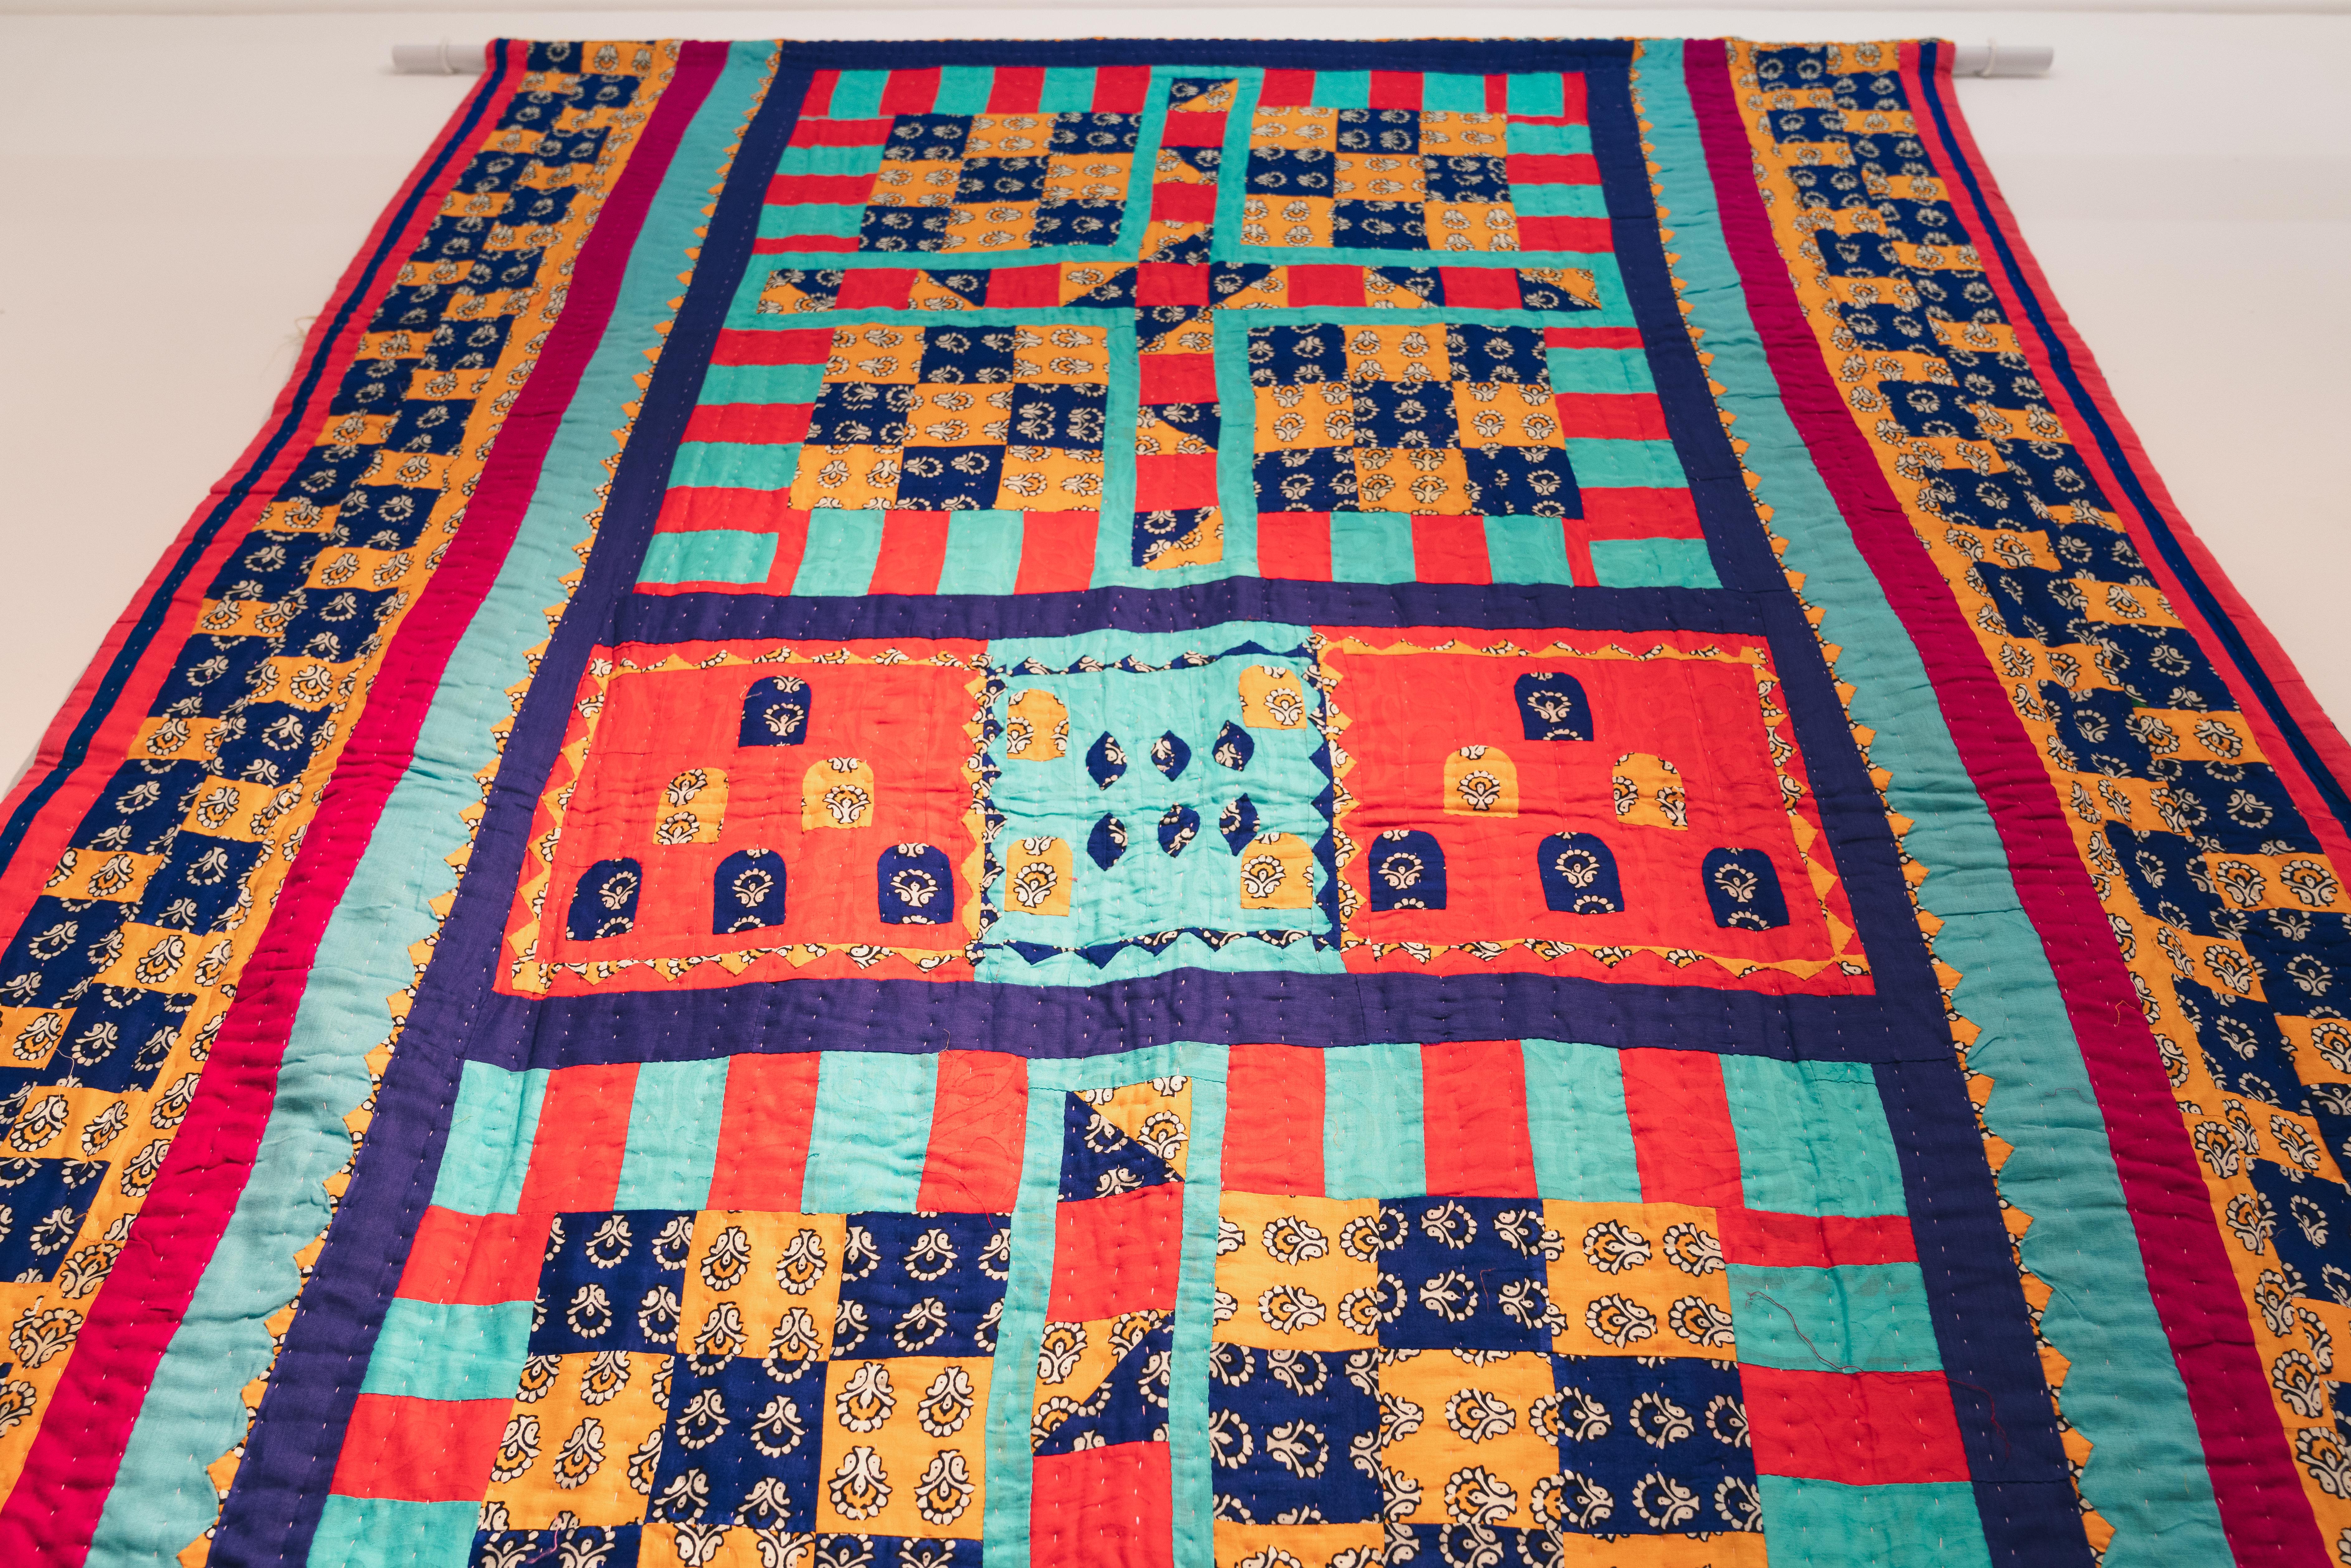 Katab Quilting Stories - Blackburn Museum - British Textile Biennial - 04-10-19 - Richard Tymon-14